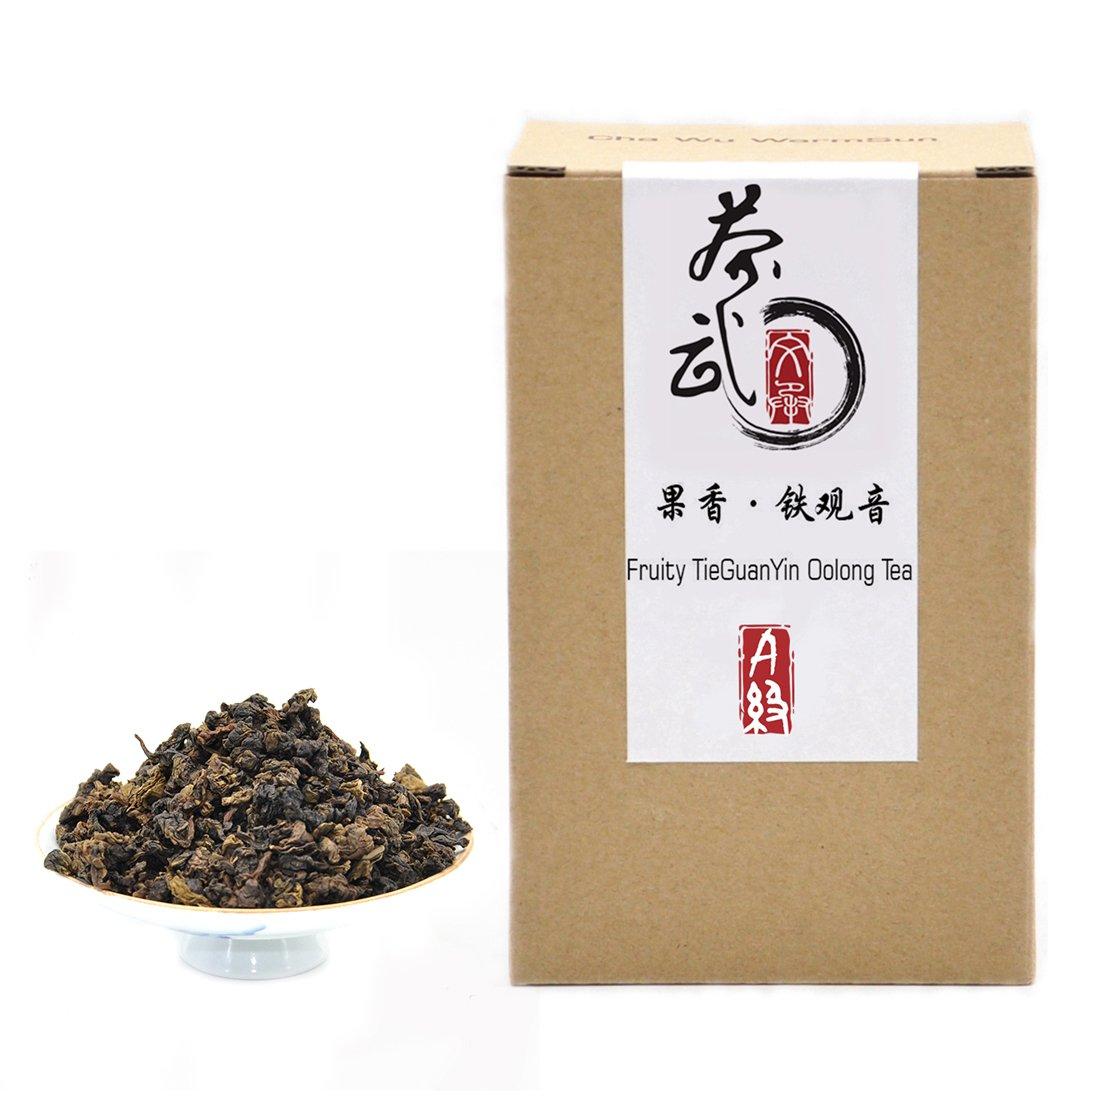 Cha Wu-[A] Fruity Tieguanyin Oolong Tea,8.8oz/250g,Light Roasting,AnXi Loose Leaf WuLong Tea,Chinese